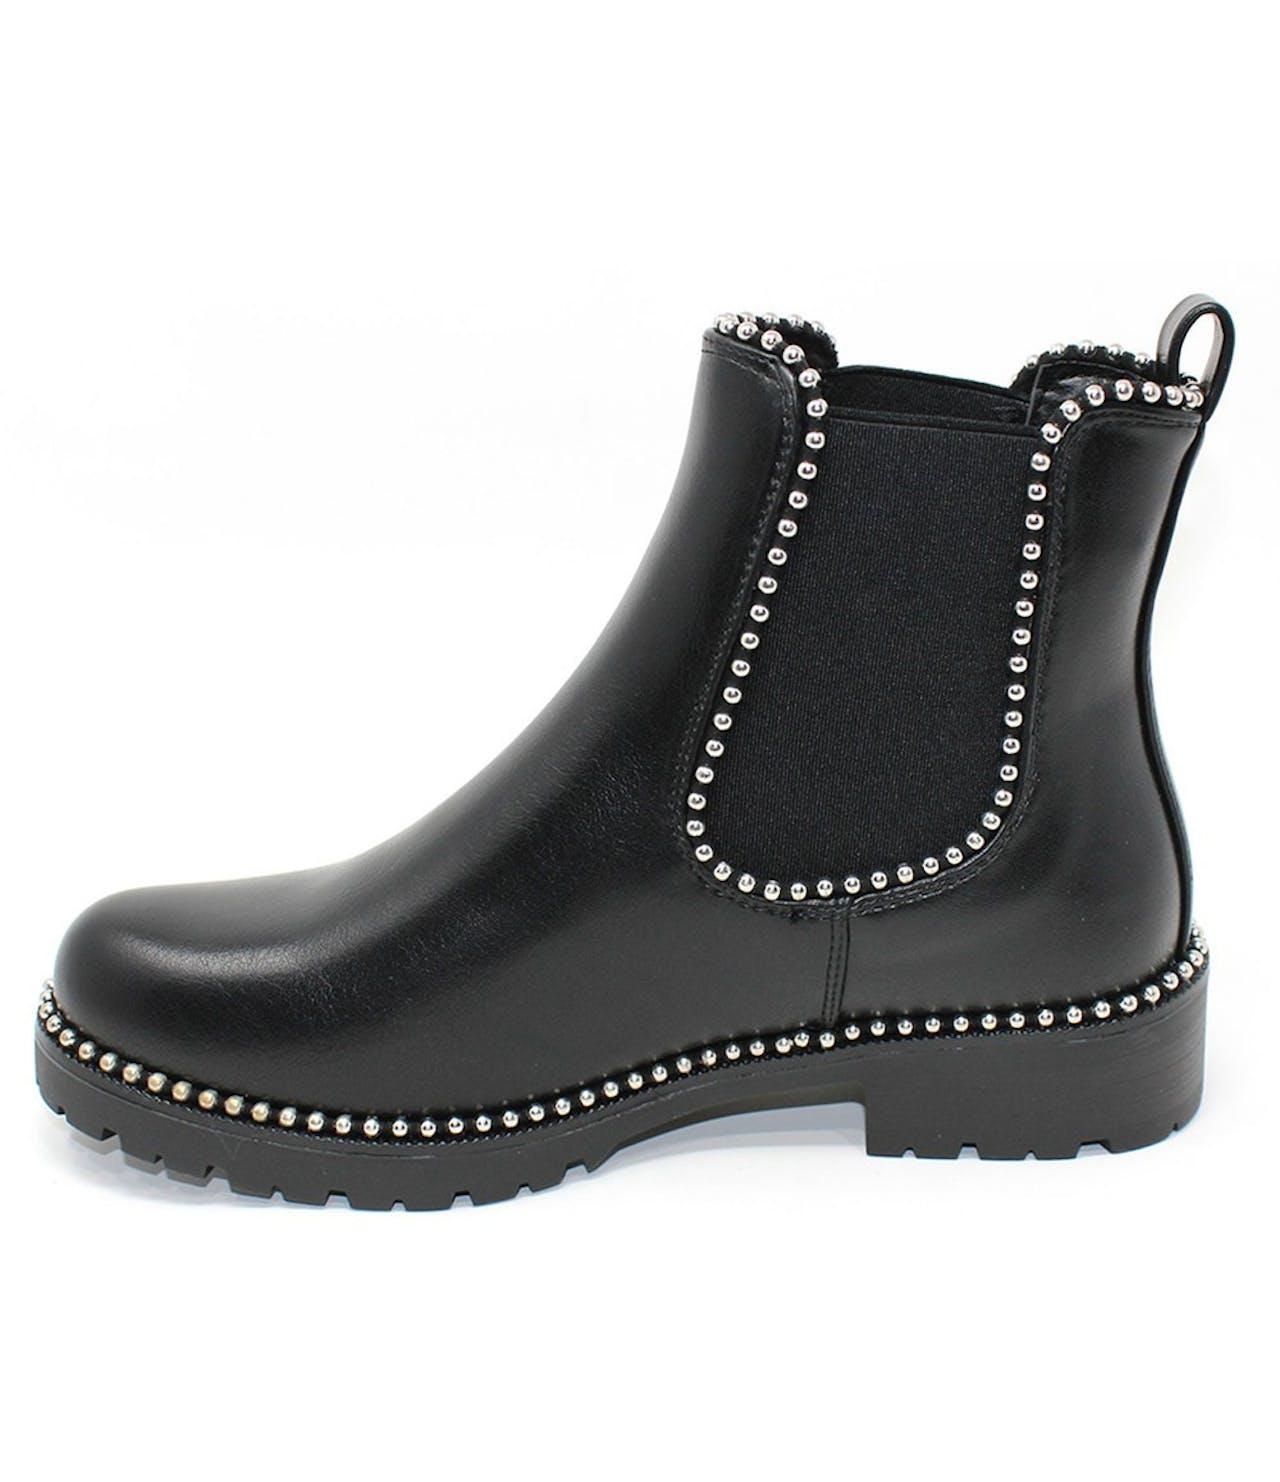 Shoe Lounge Black Chelsea Boot